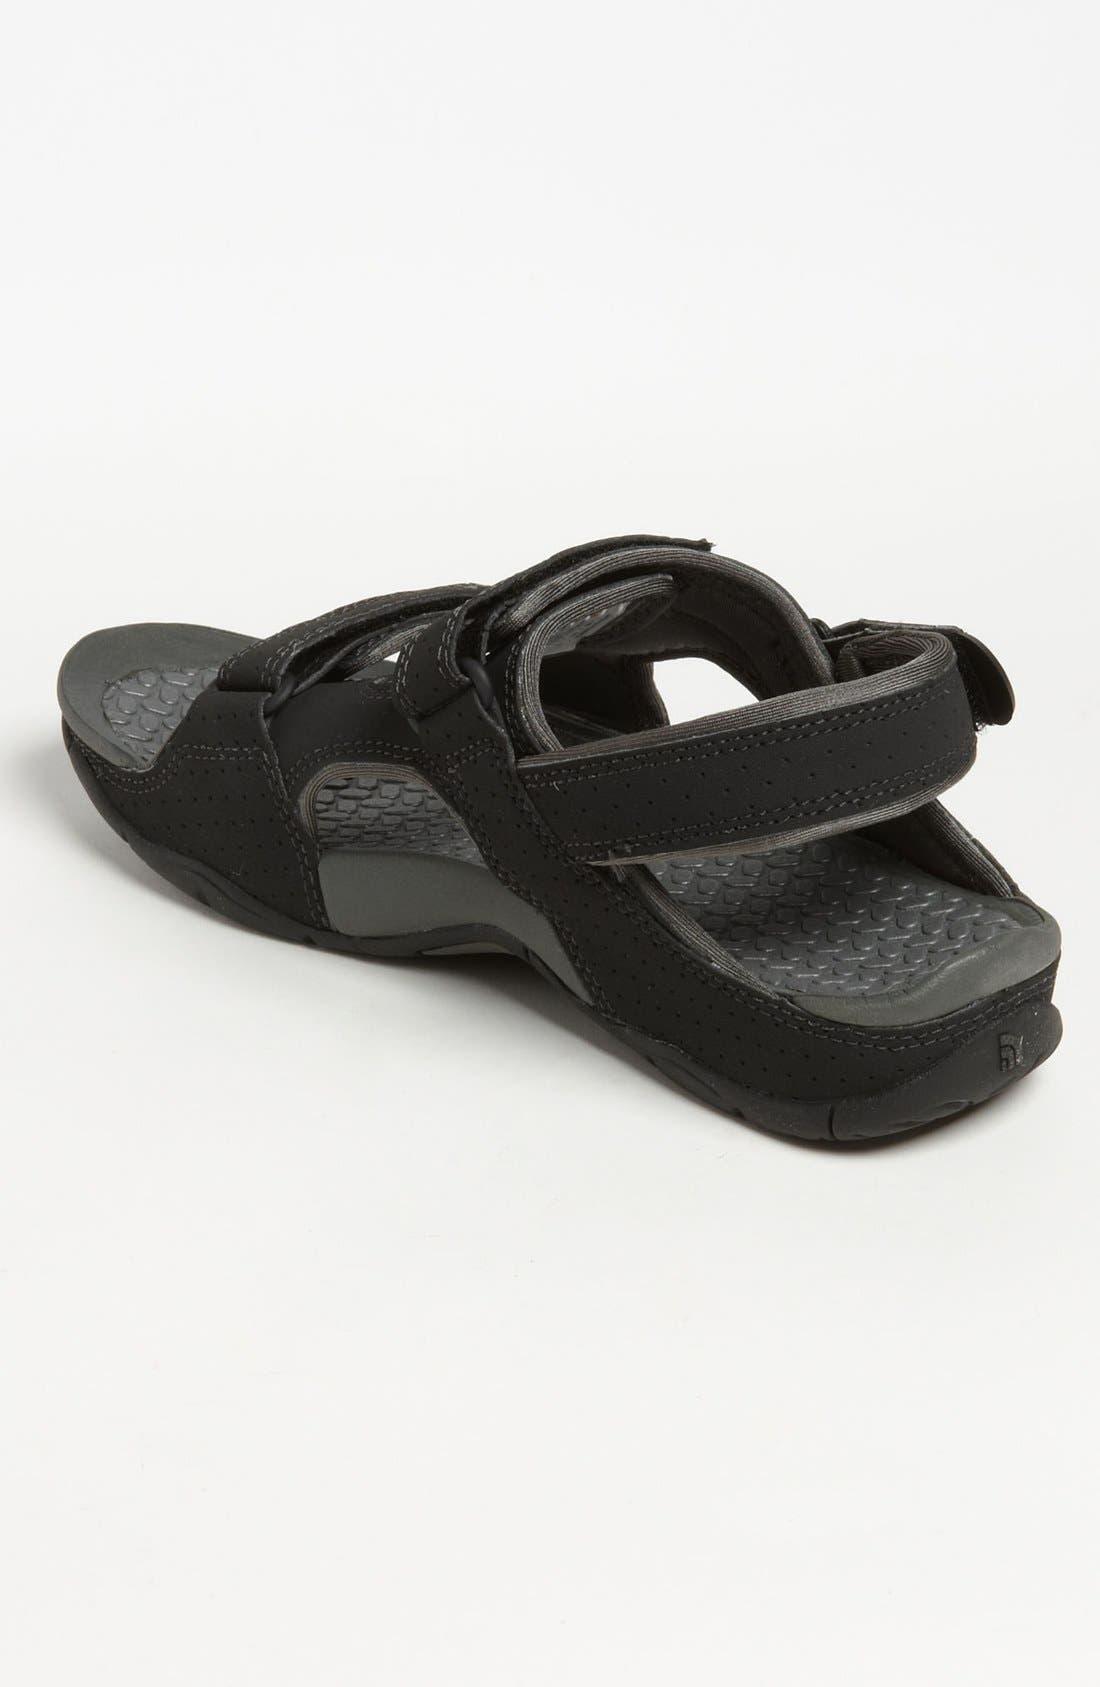 Alternate Image 2  - The North Face 'El Rio II' Sandal (Men)